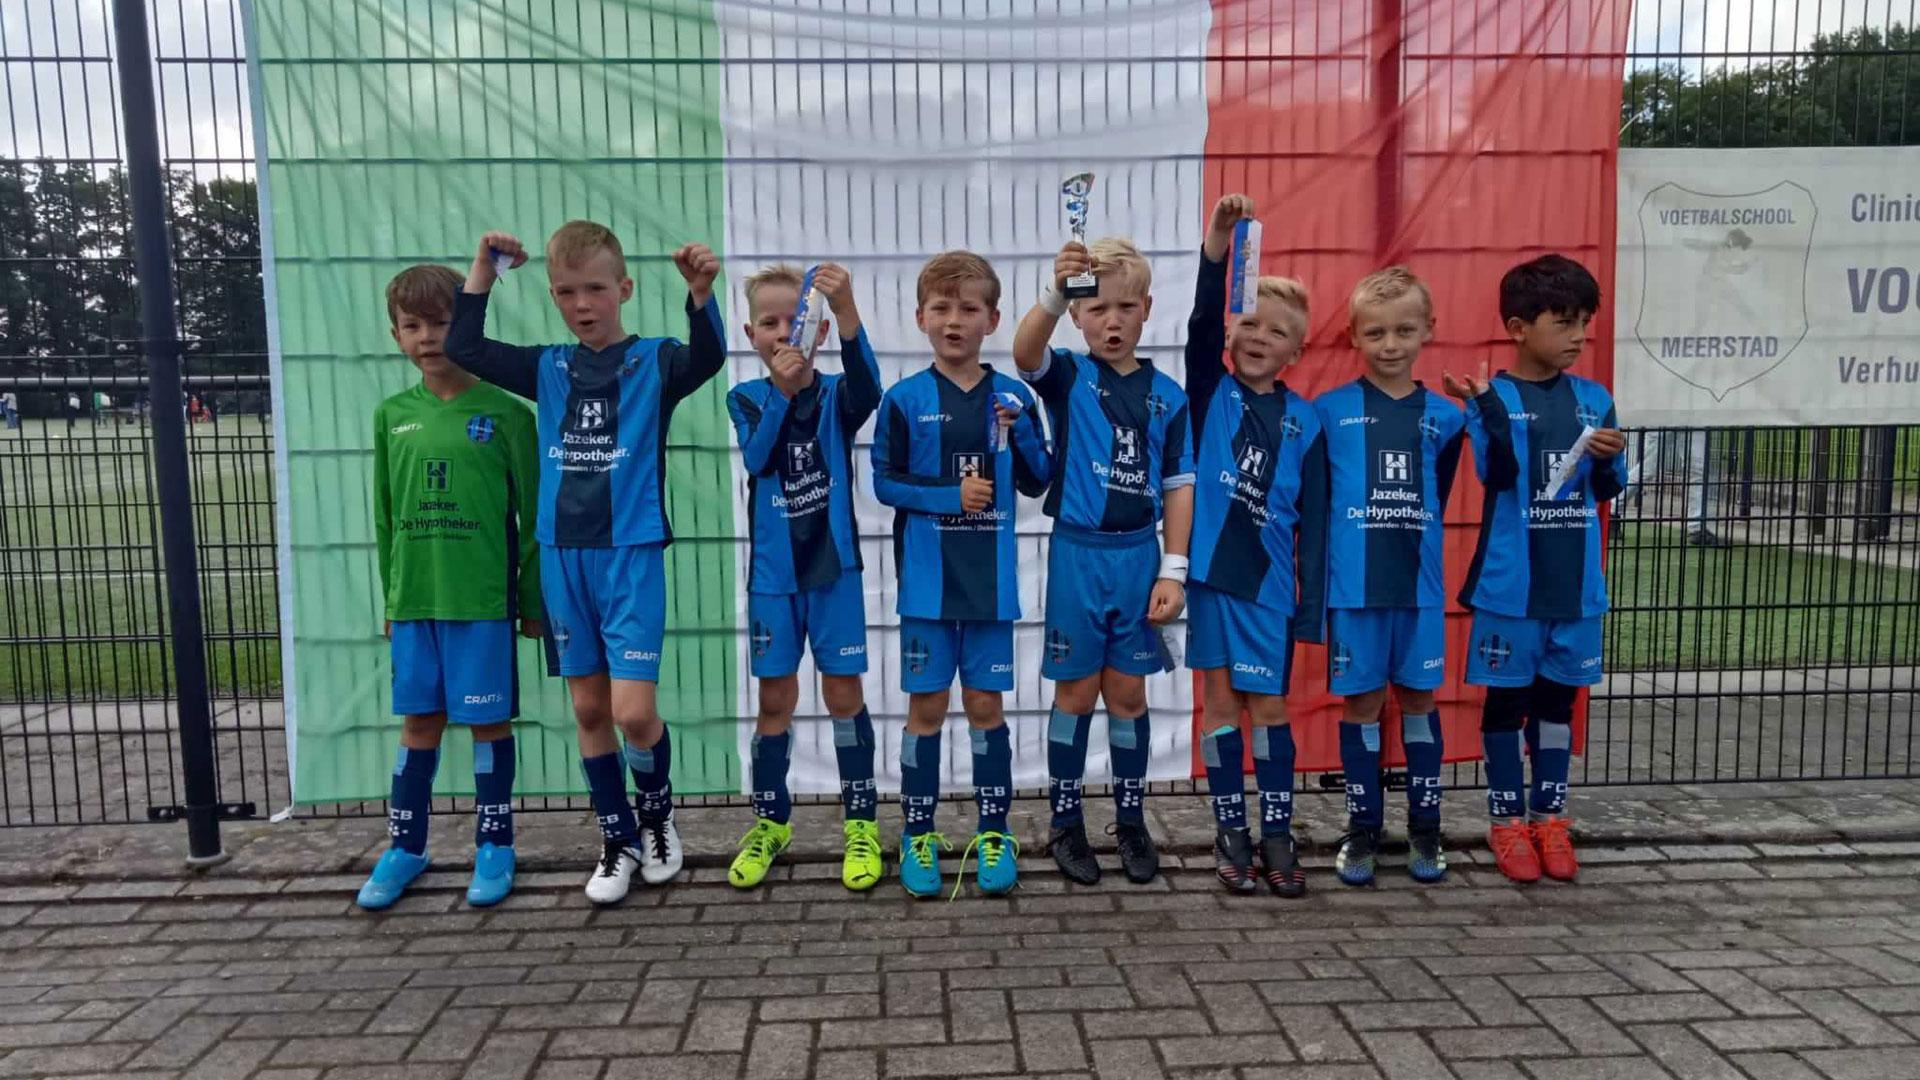 FC Burgum 8-1 wint toernooi vv Helpman!